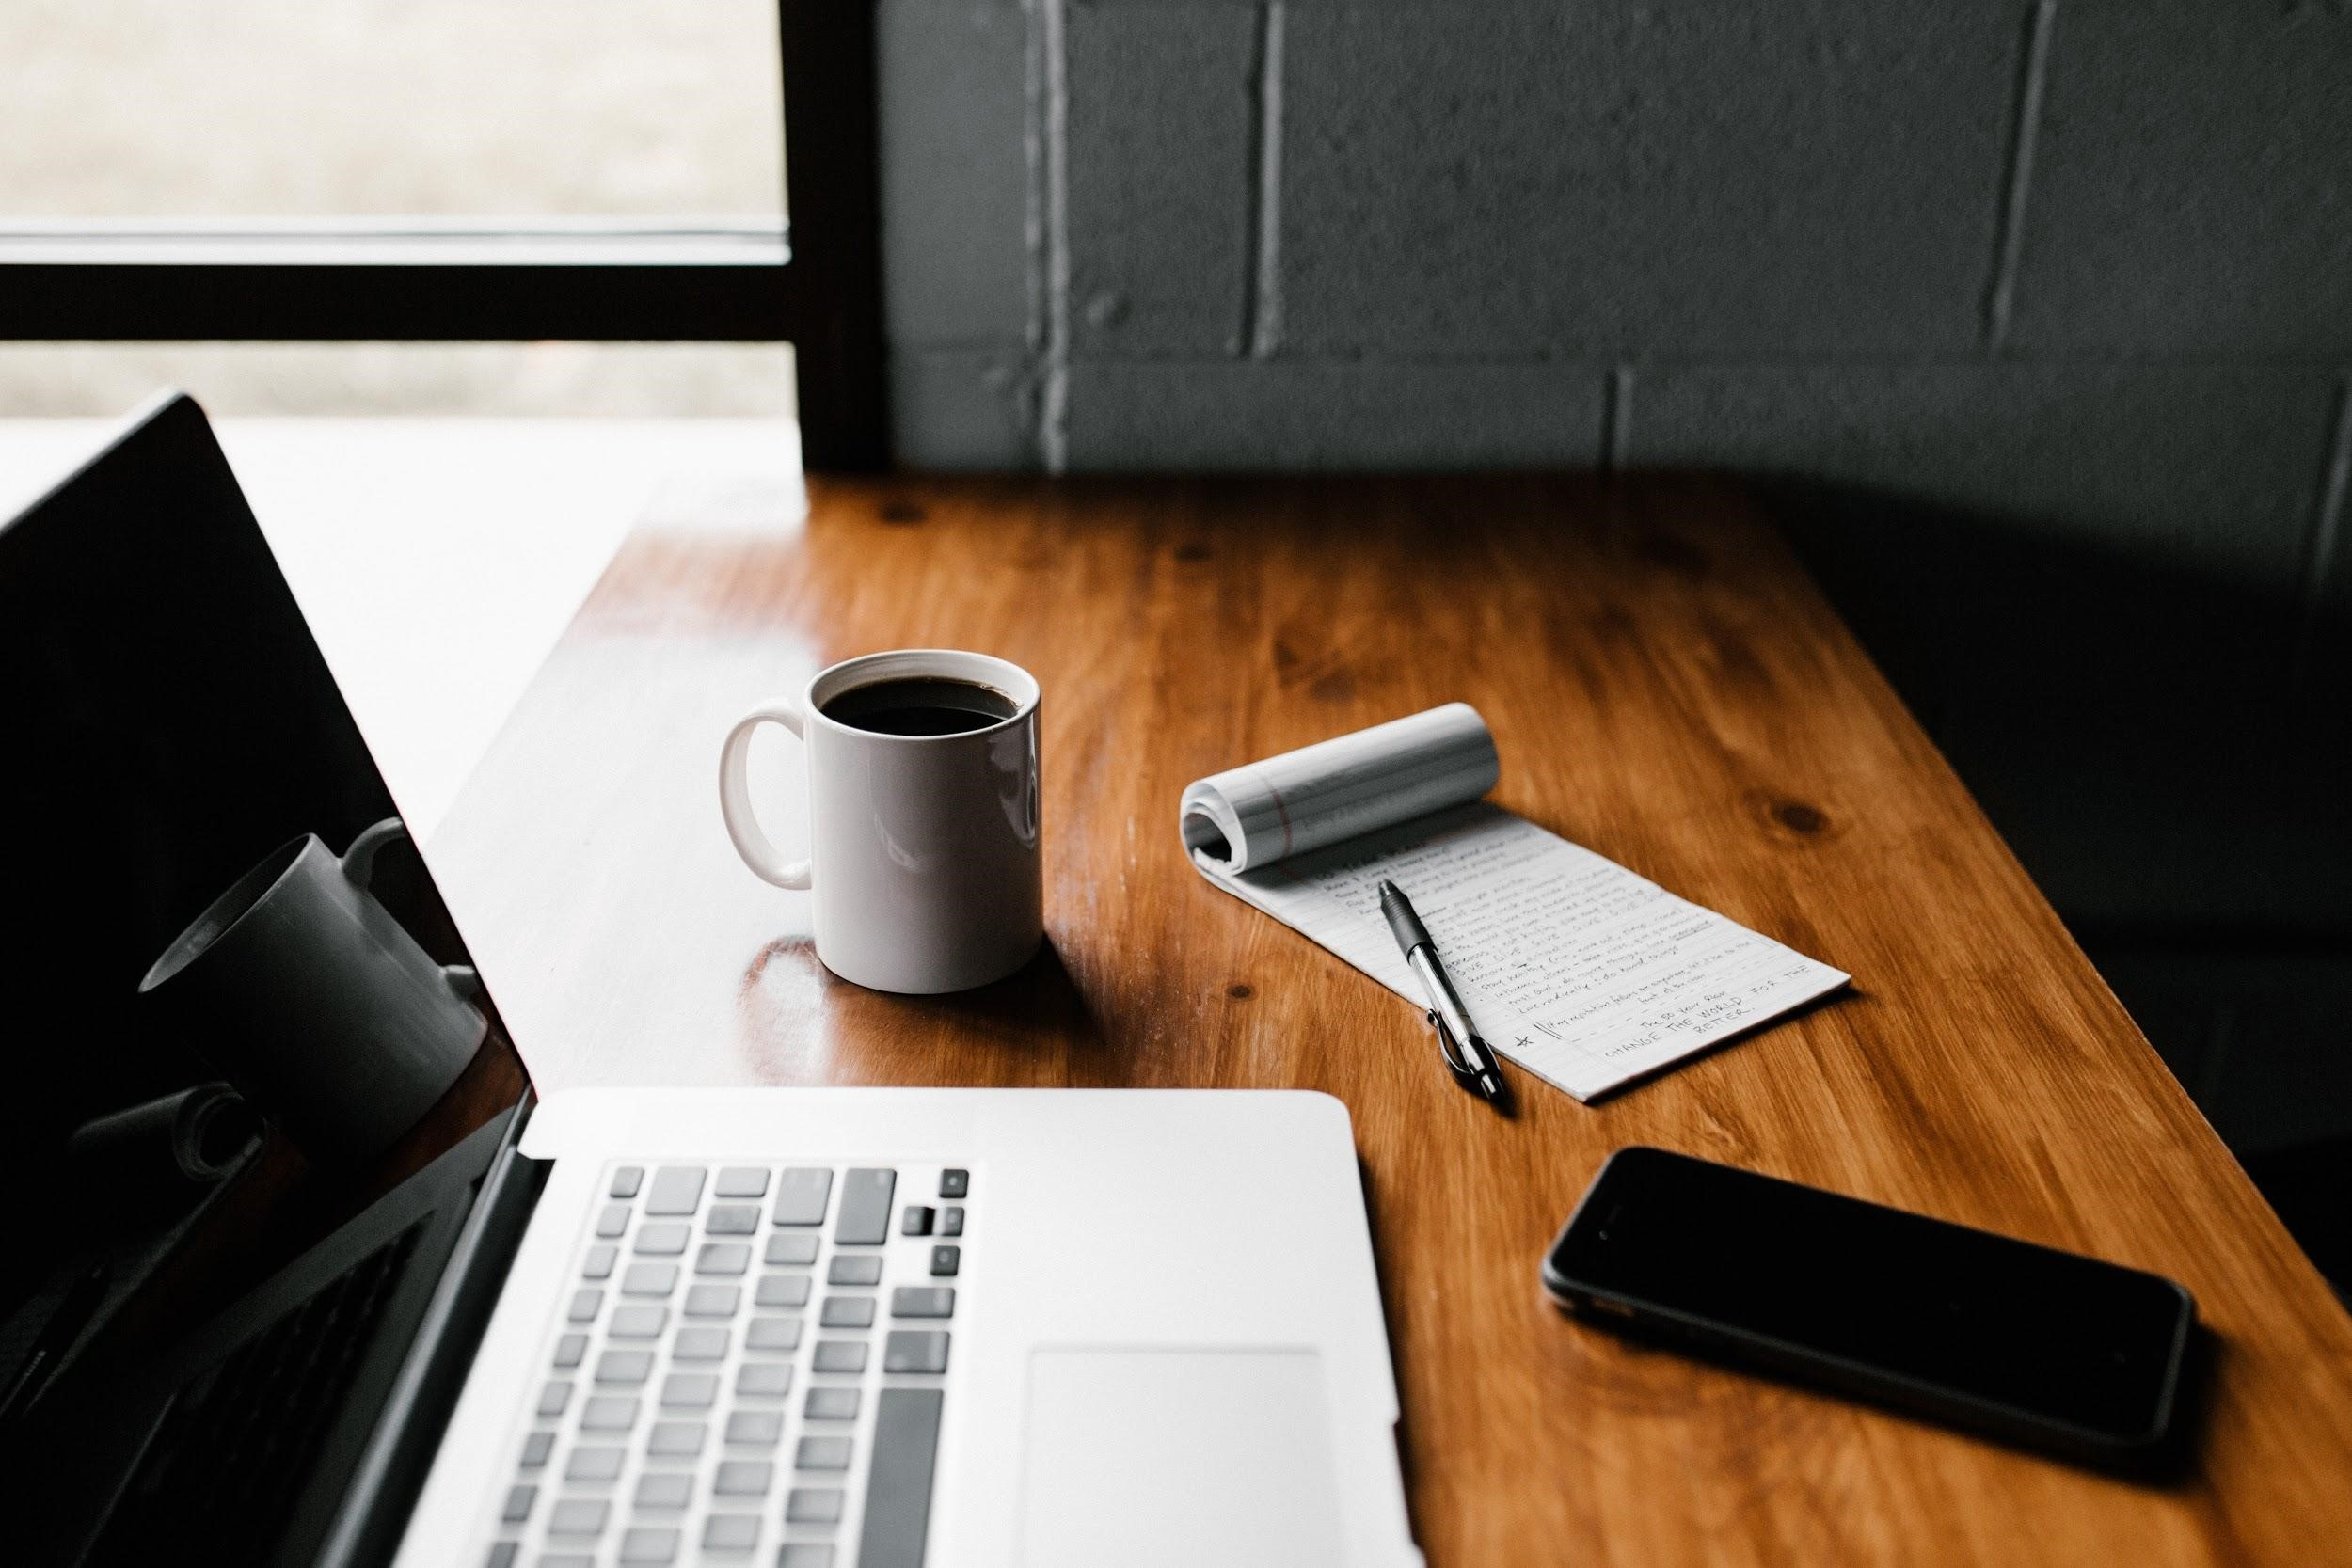 laptop-notepad-cellphone